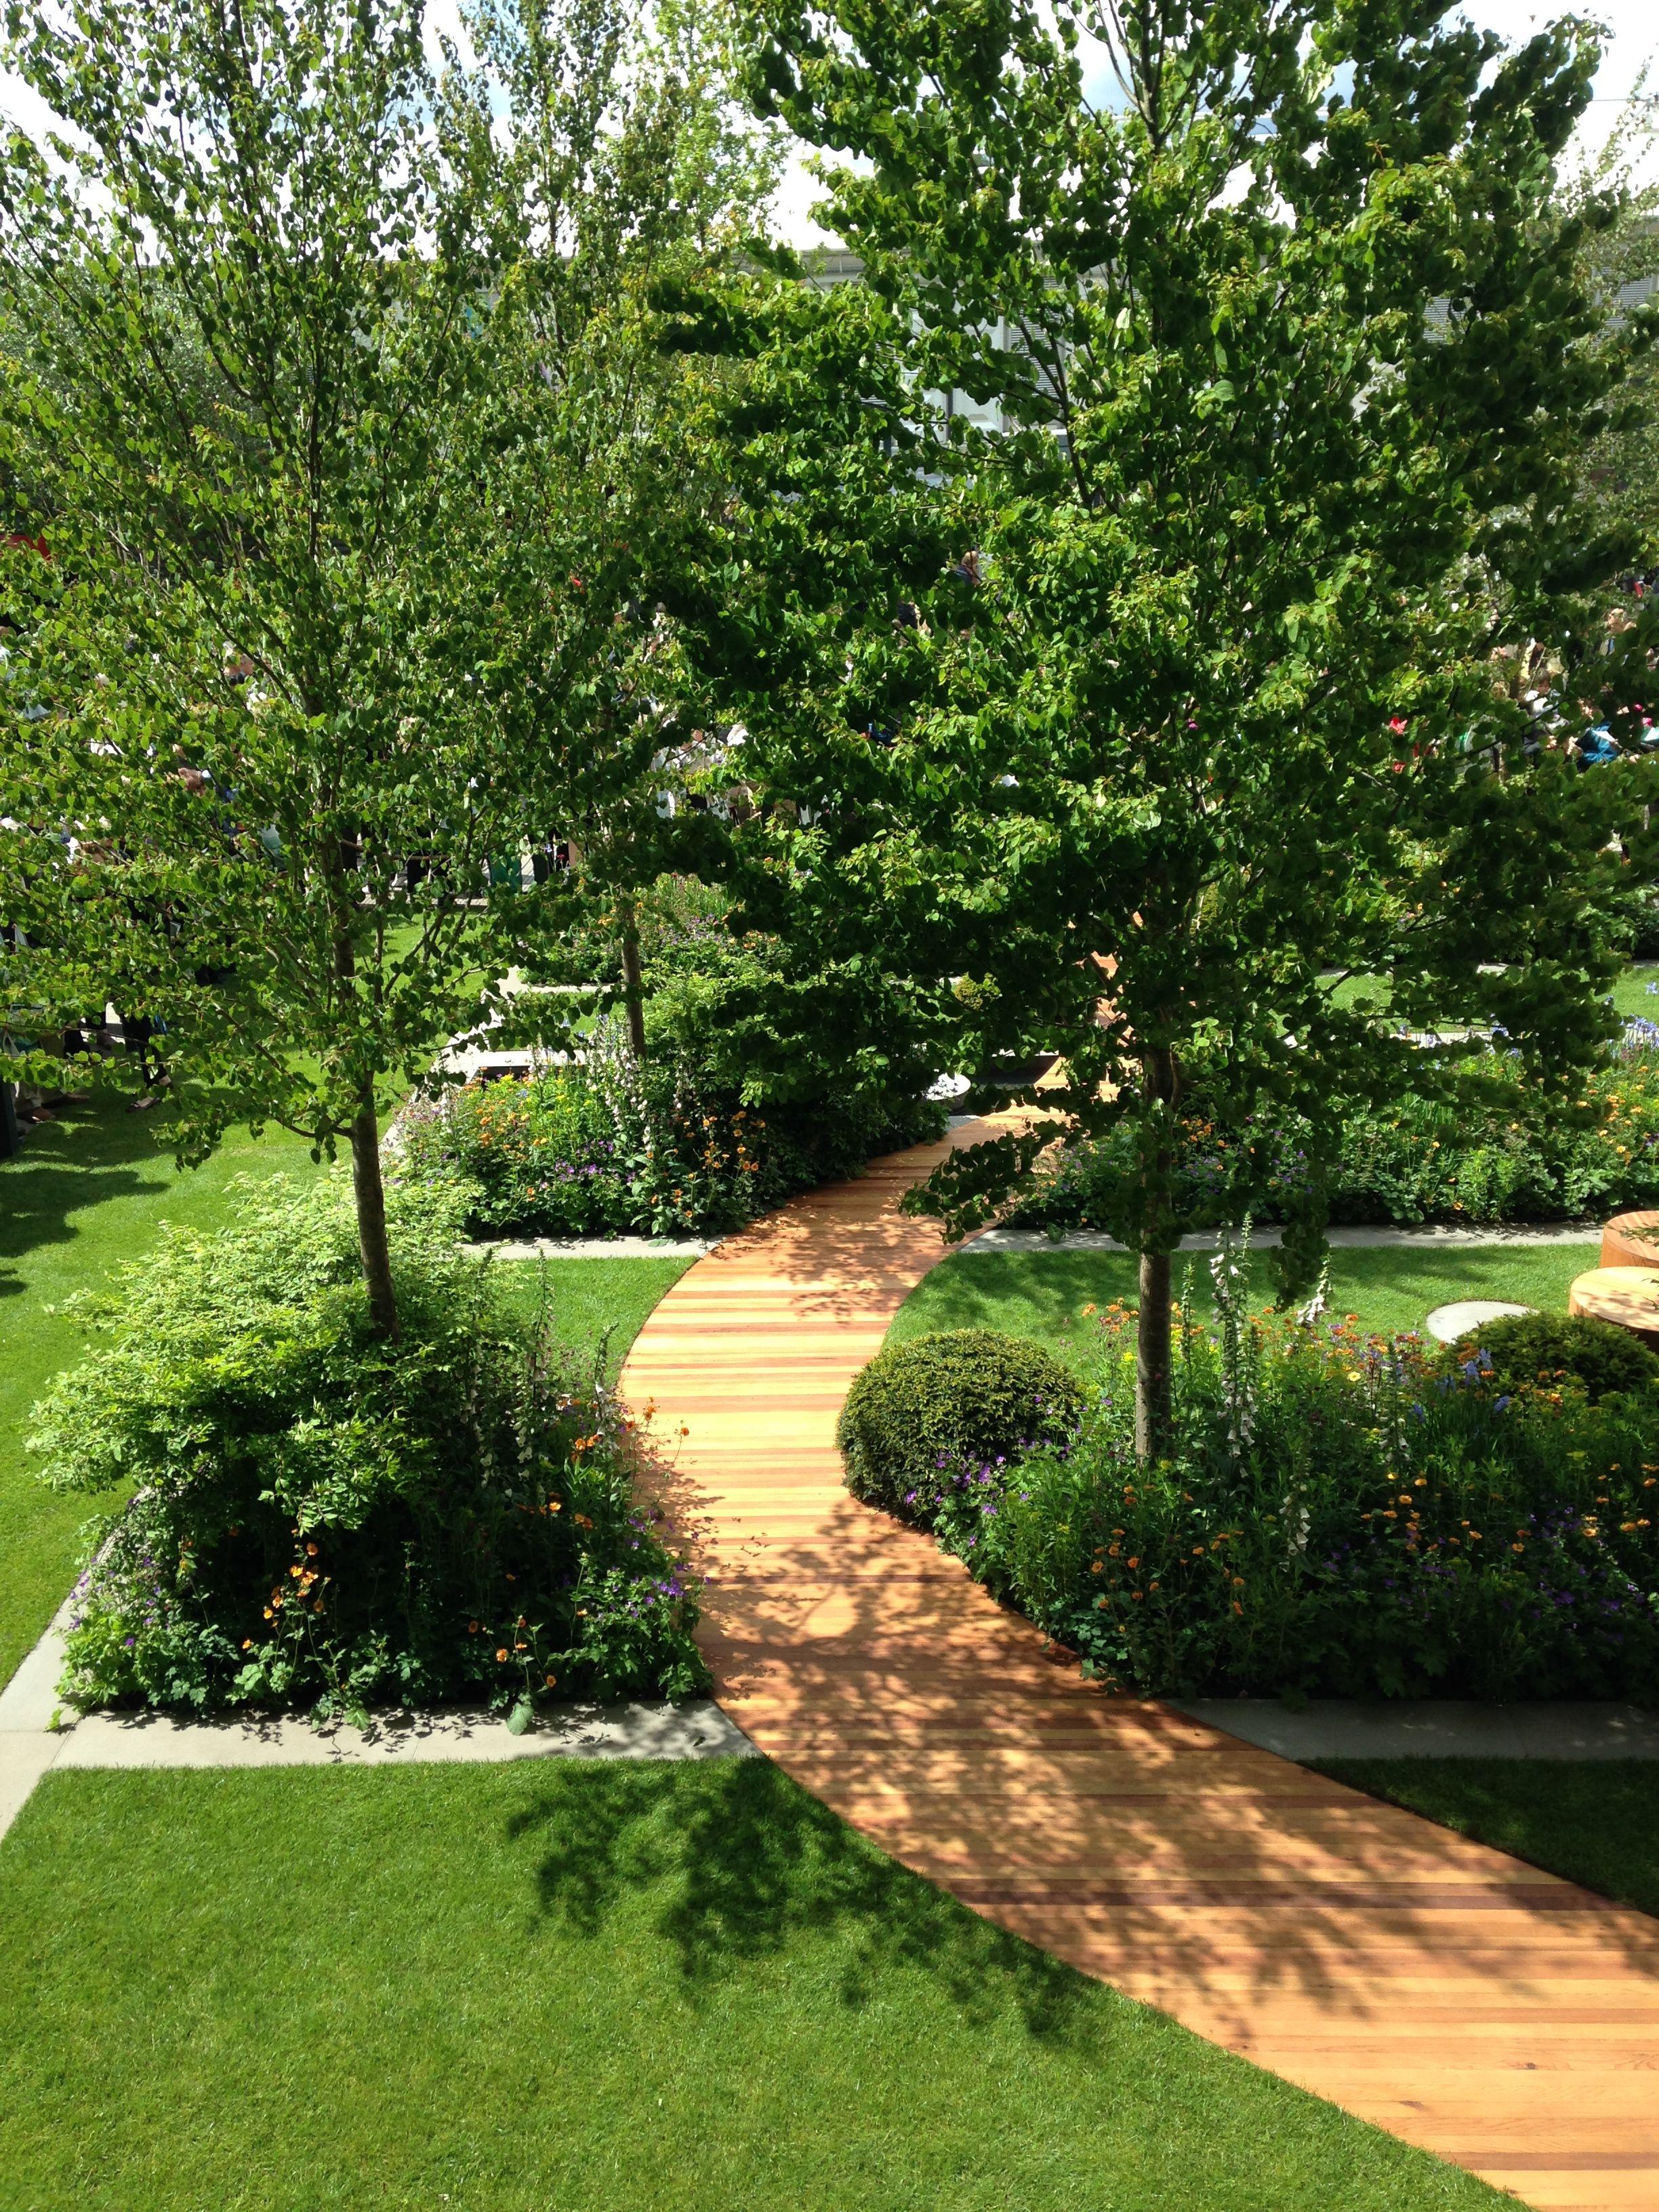 Homebase Urban Retreat Garden   Gold Medal Winner At Chelsea Flower Show  2015 Contemporary Garden Design